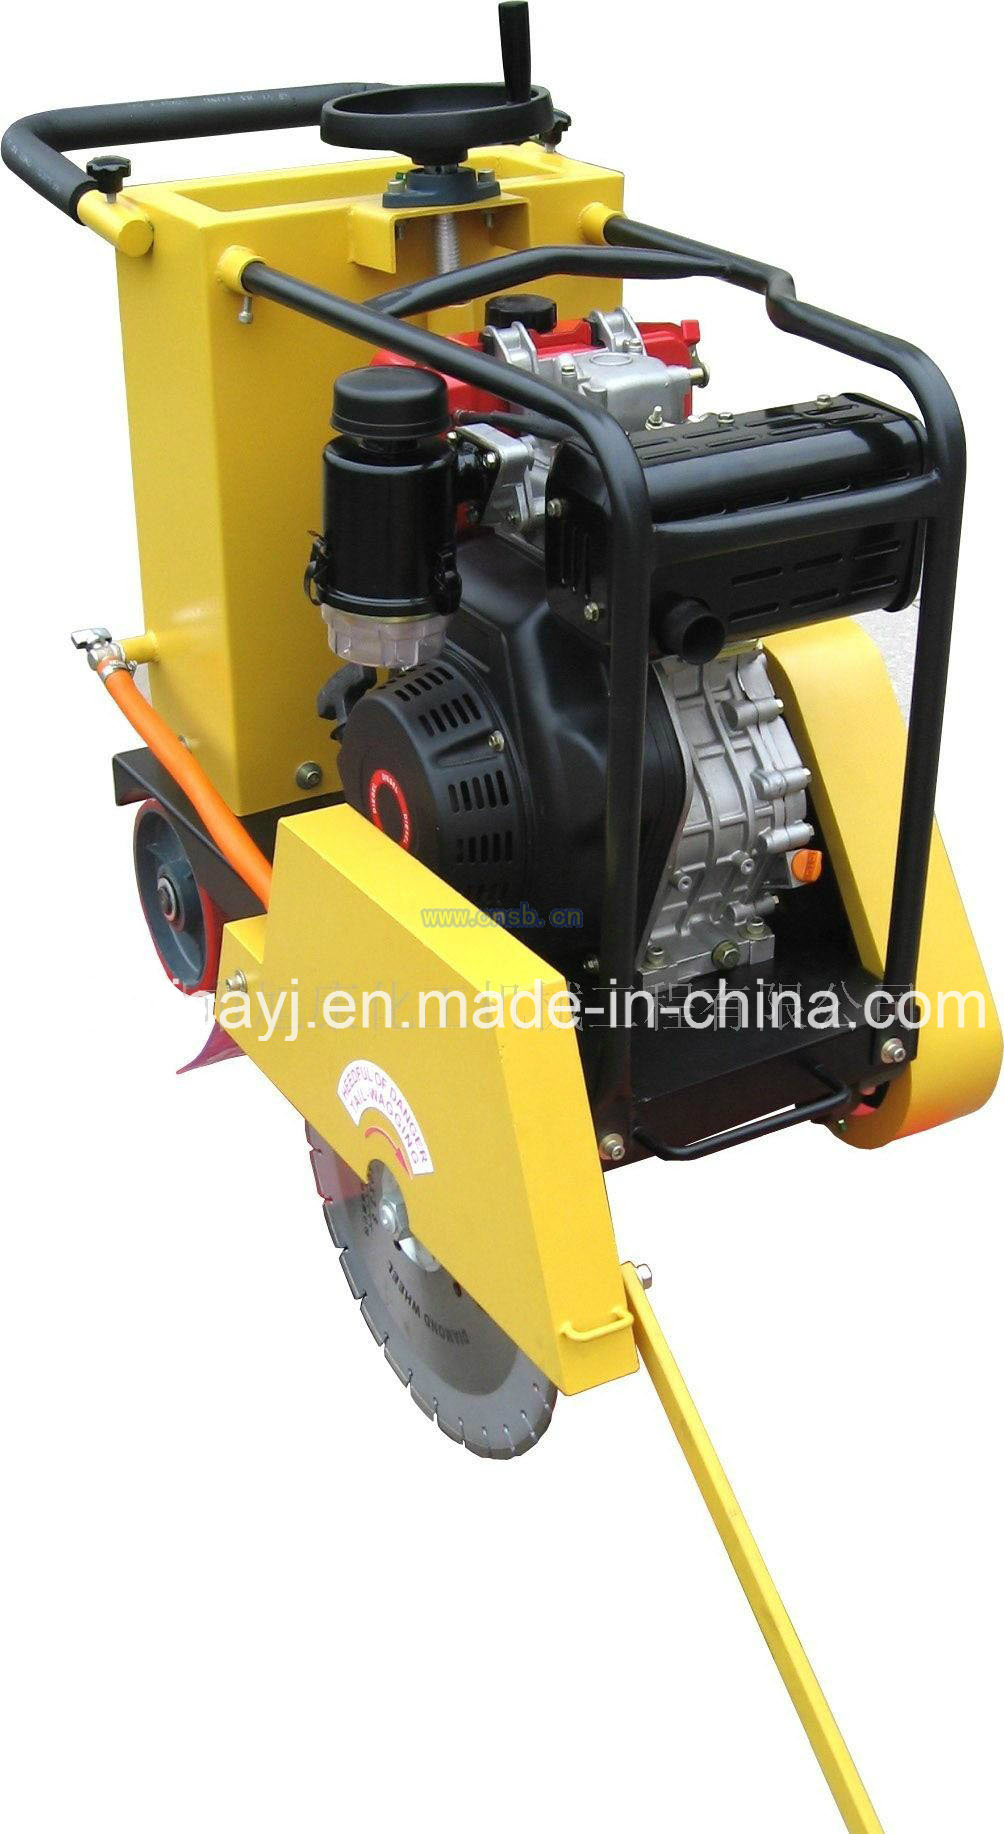 China Asphalt Concrete Cutter with Honda Engine Gx270 - China Concrete  Cutter, Road Cutter